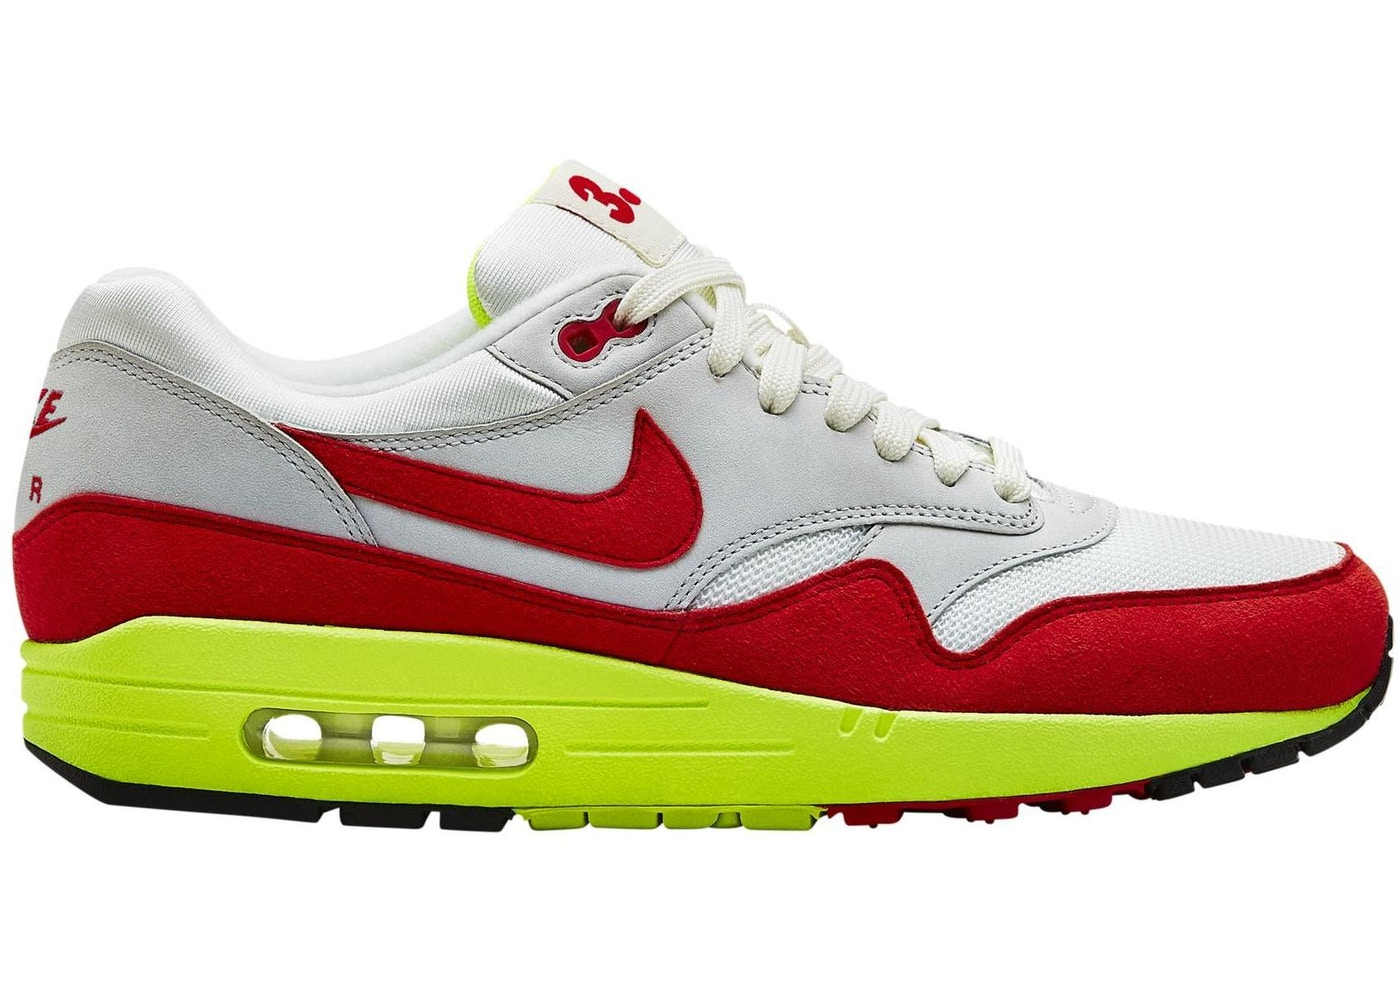 menta anunciar aniversario  Nike Air Max 1 Air Max Day 3.26 - 665873-106